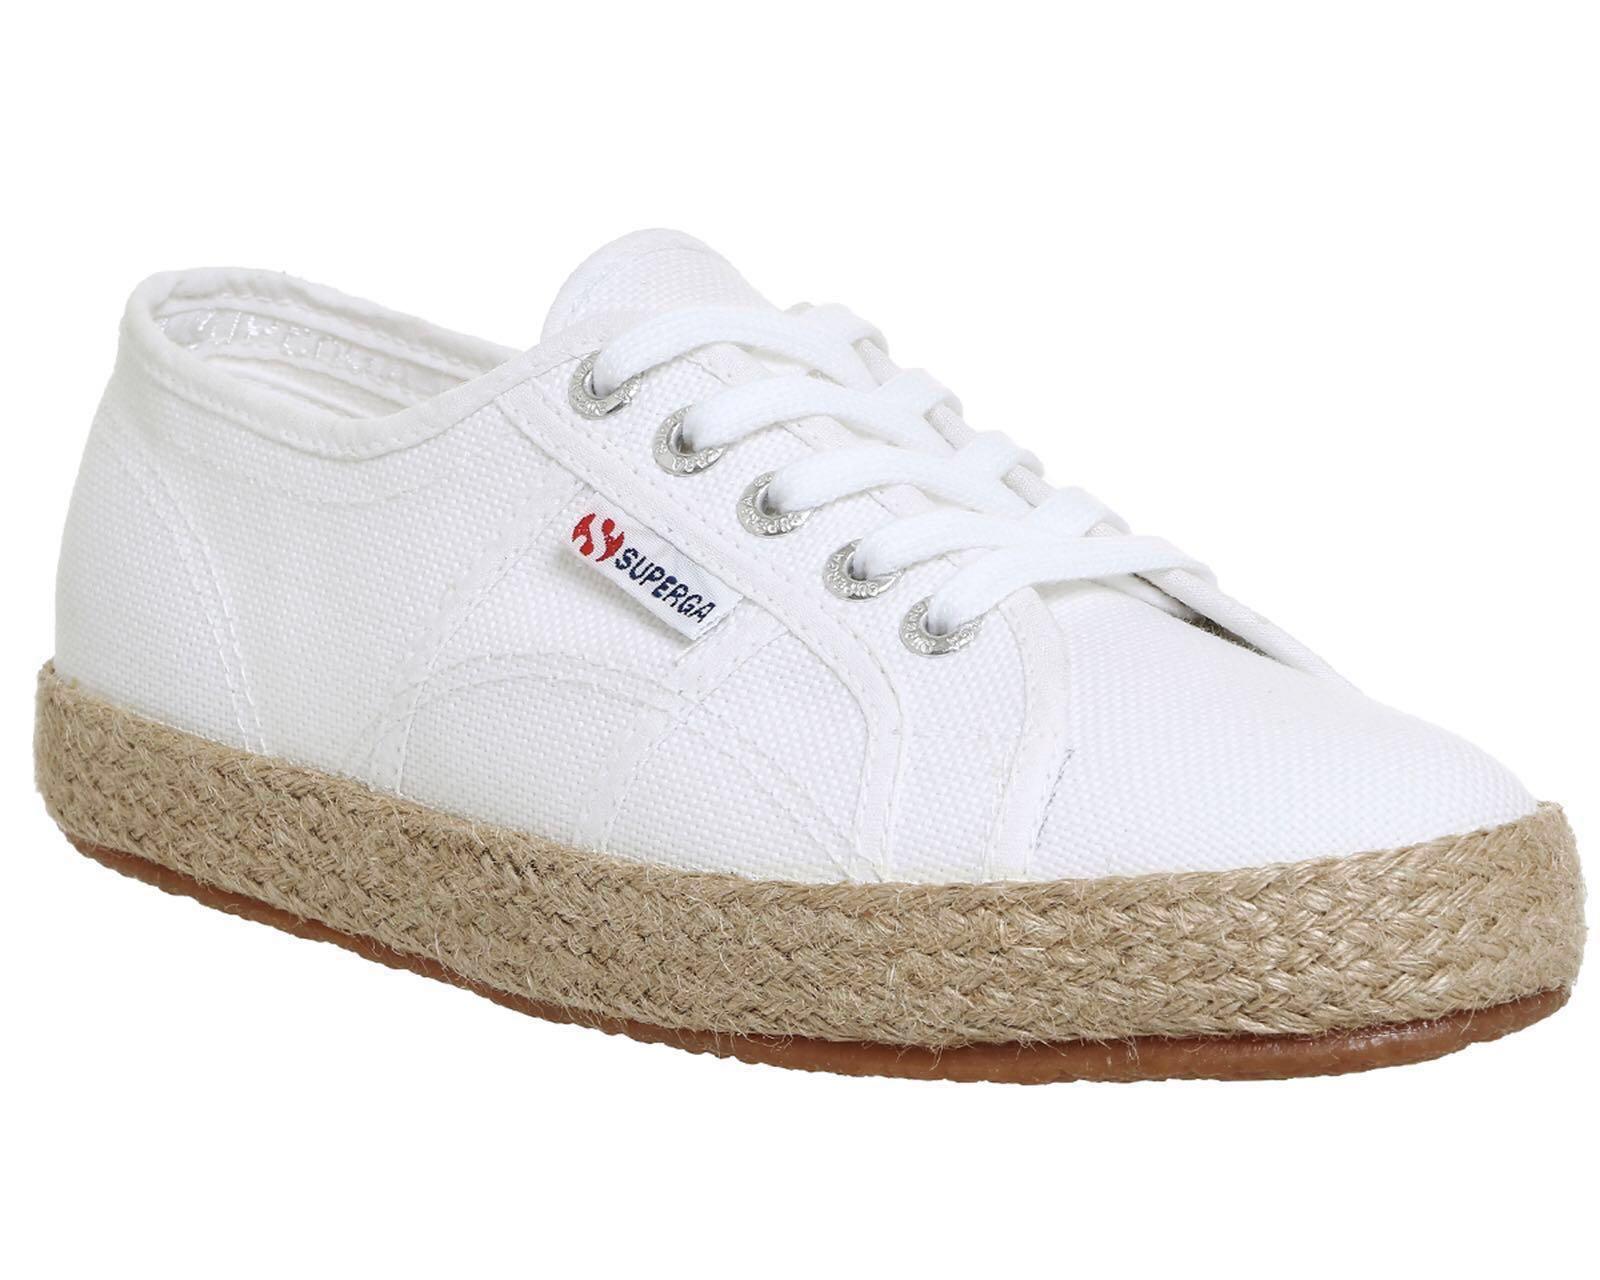 b2b8bc596 Superga 2750 Espadrille - White, Women's Fashion, Shoes, Sneakers on  Carousell